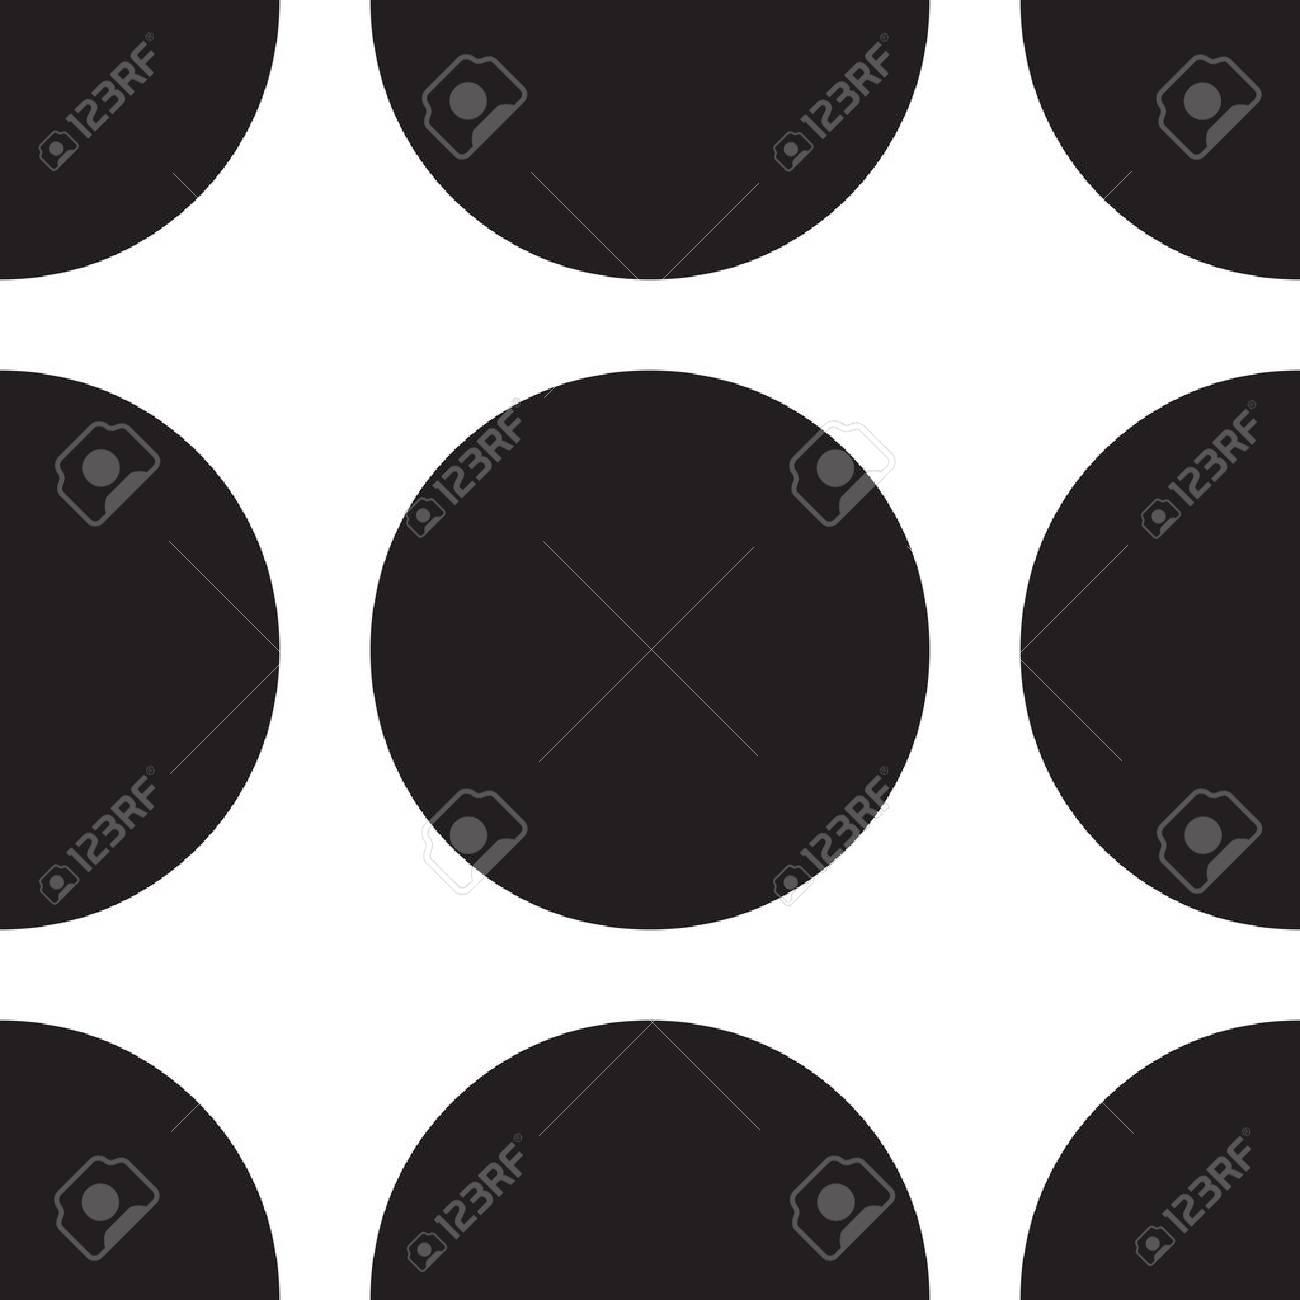 Sfondo bianco con punto nero